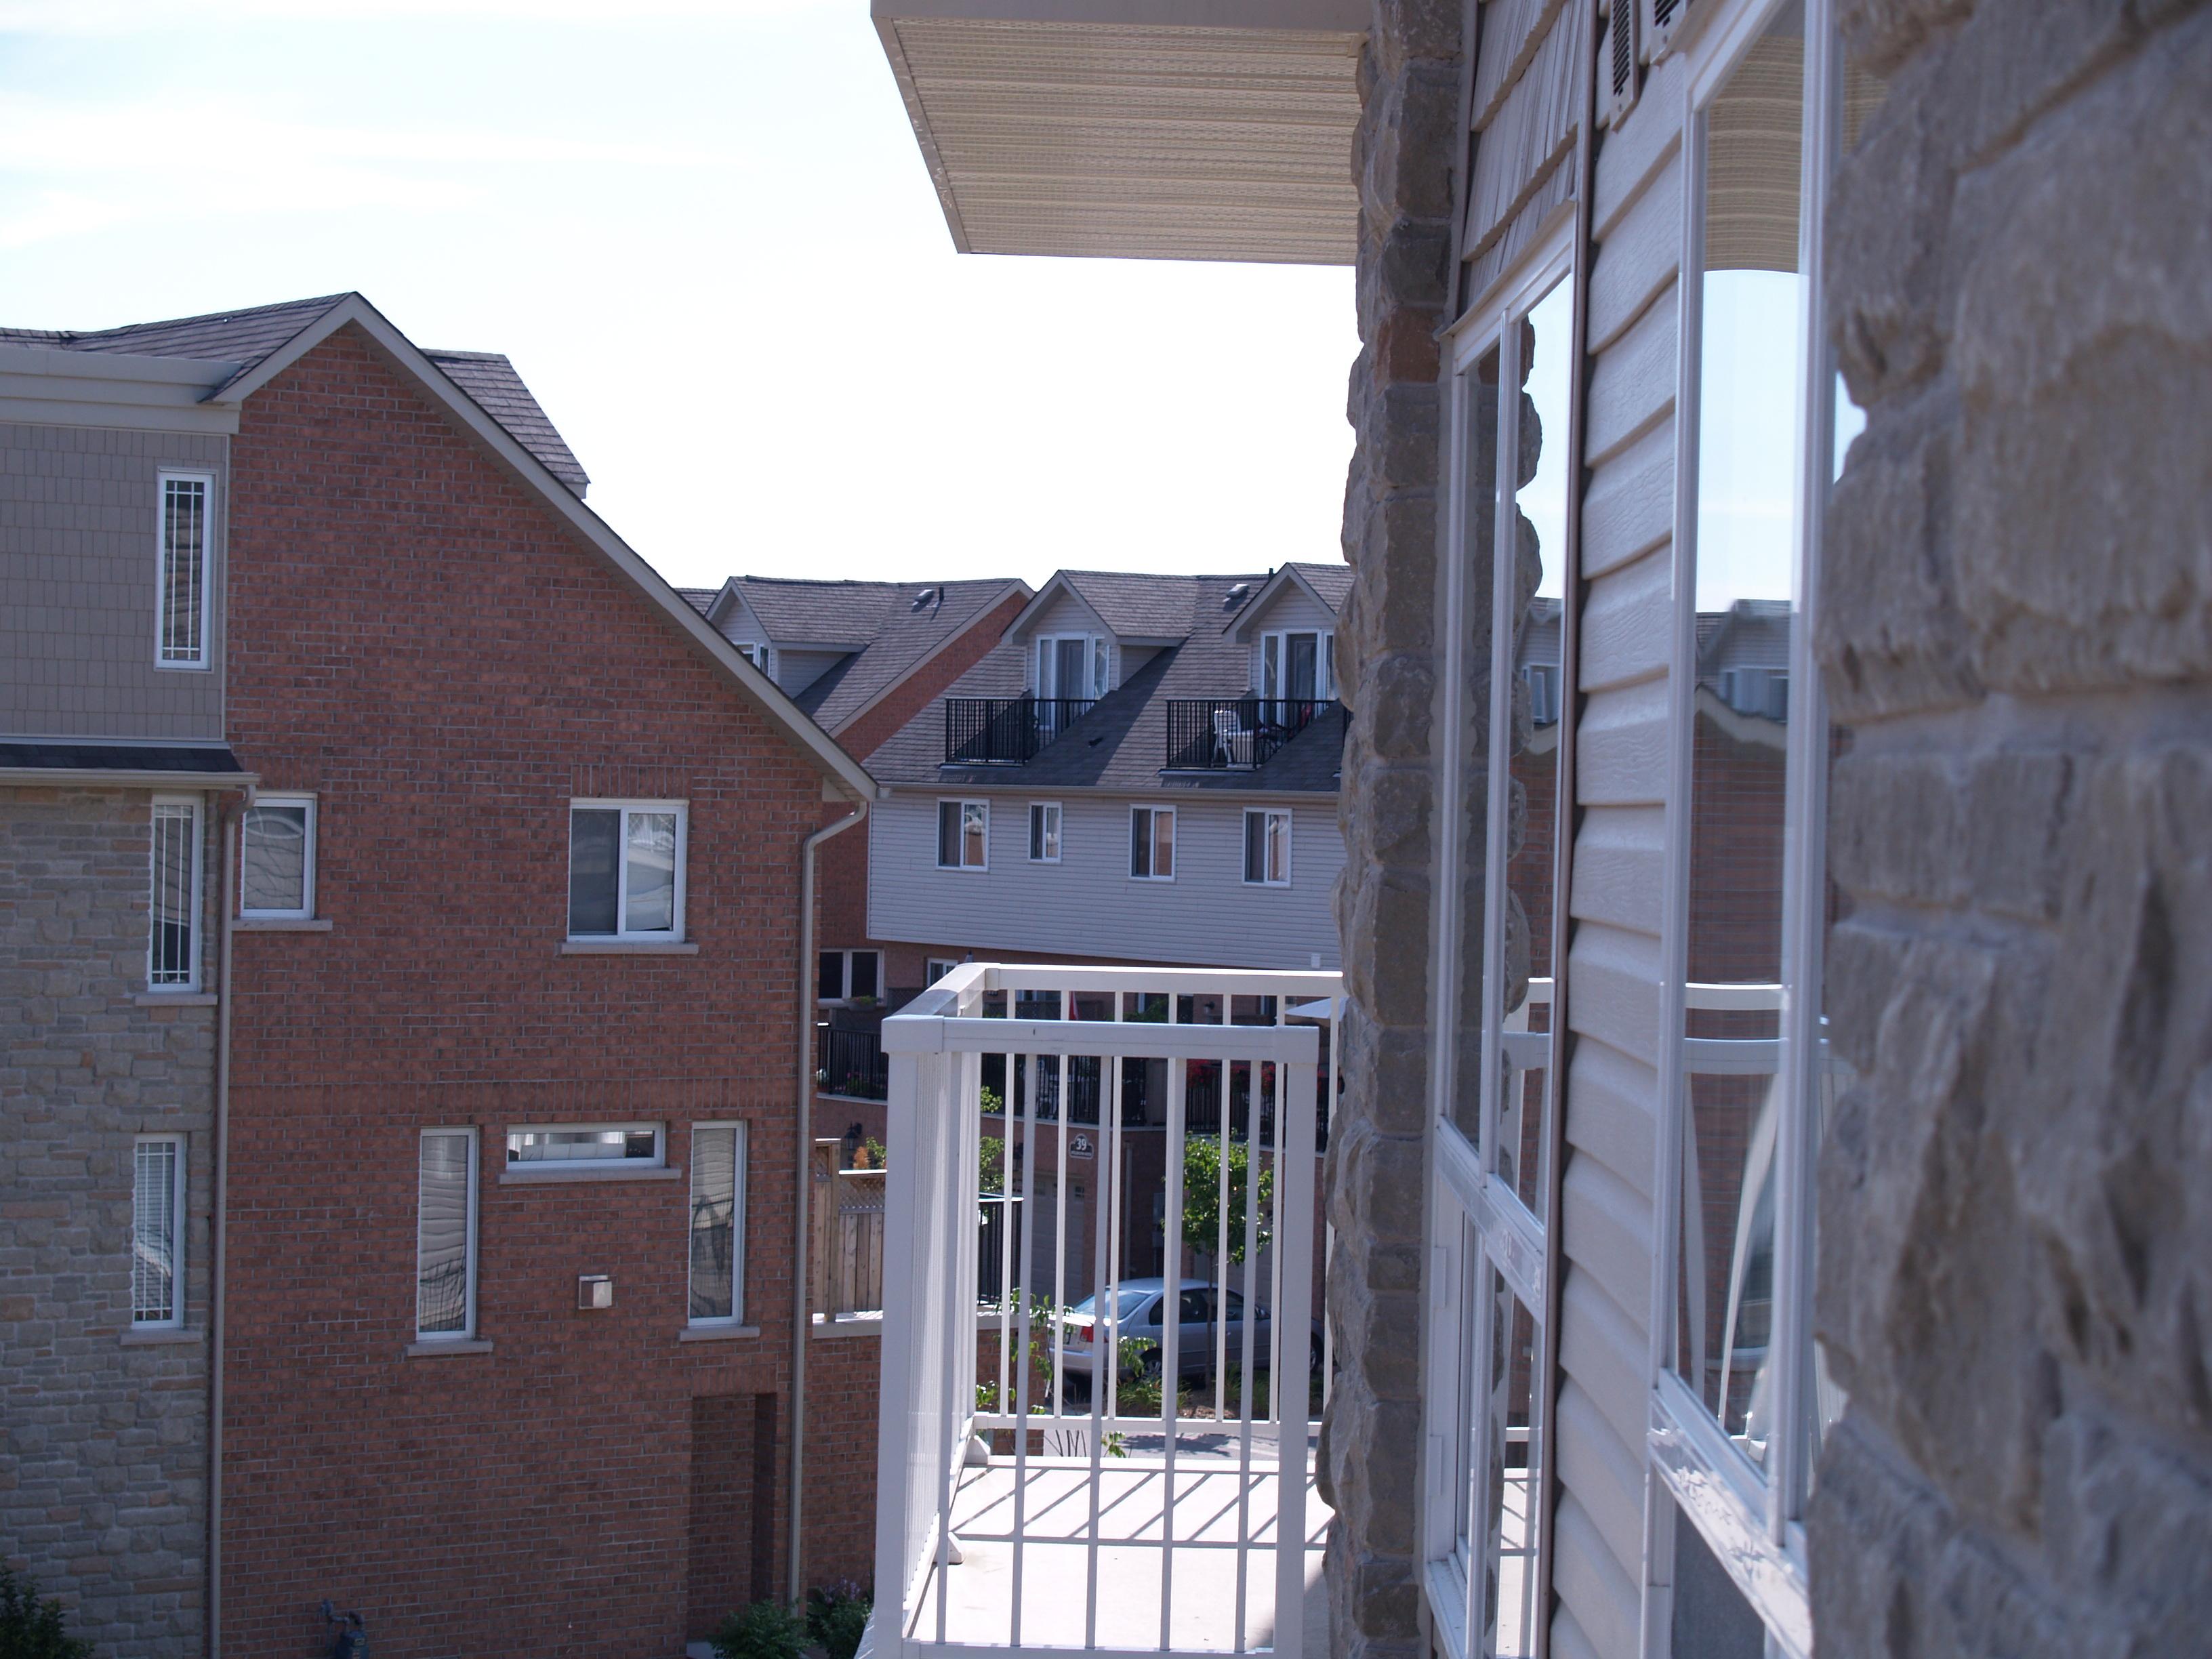 Residential_Houses_Neighbourhood_4.jpg